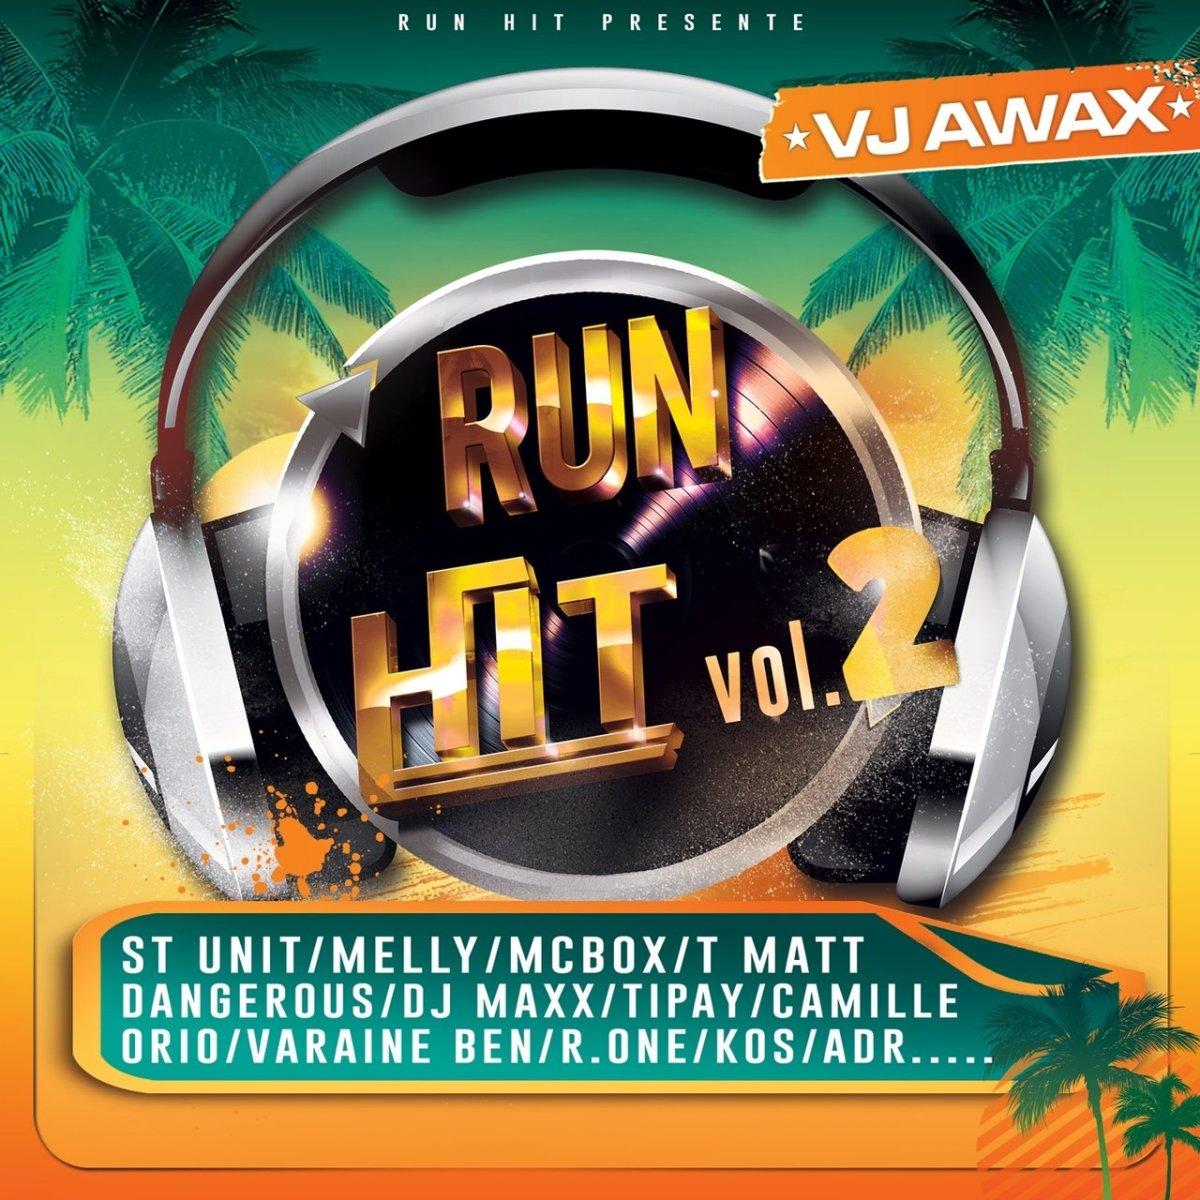 VJ Awax - Run Hit Vol. 2 (Cover)